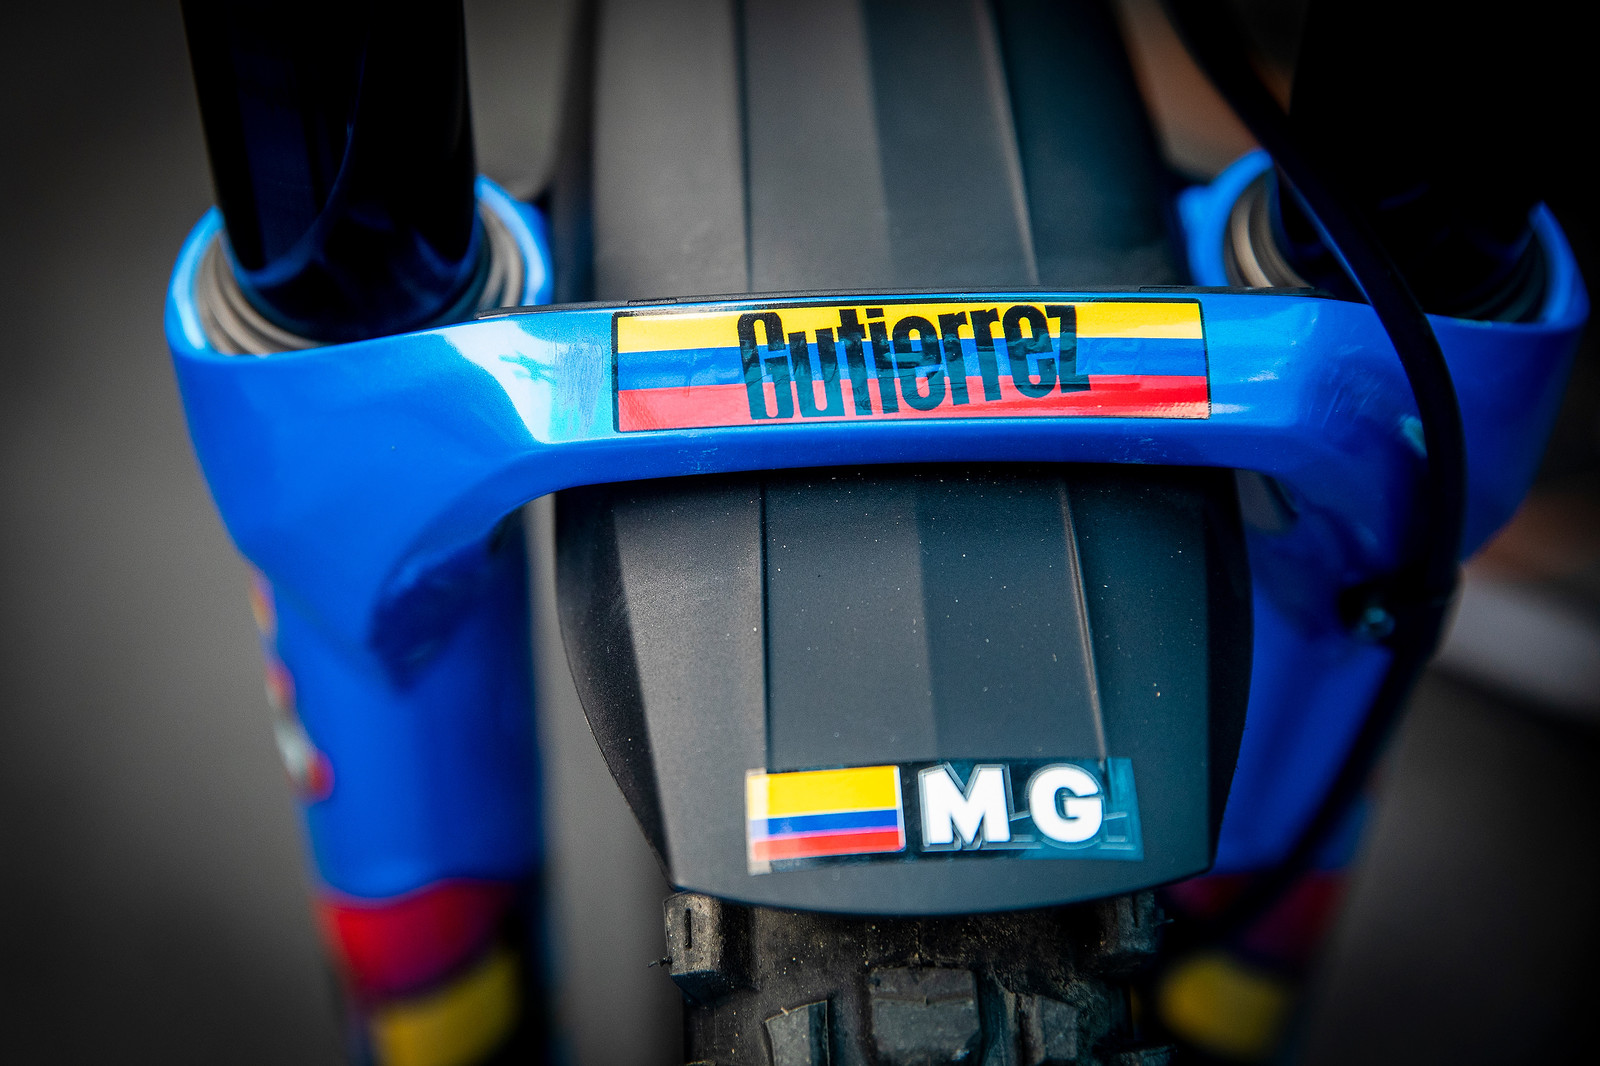 Colombian Colors - WORLD CHAMPS BIKE - Marcelo Gutierrez's Giant Glory - Mountain Biking Pictures - Vital MTB